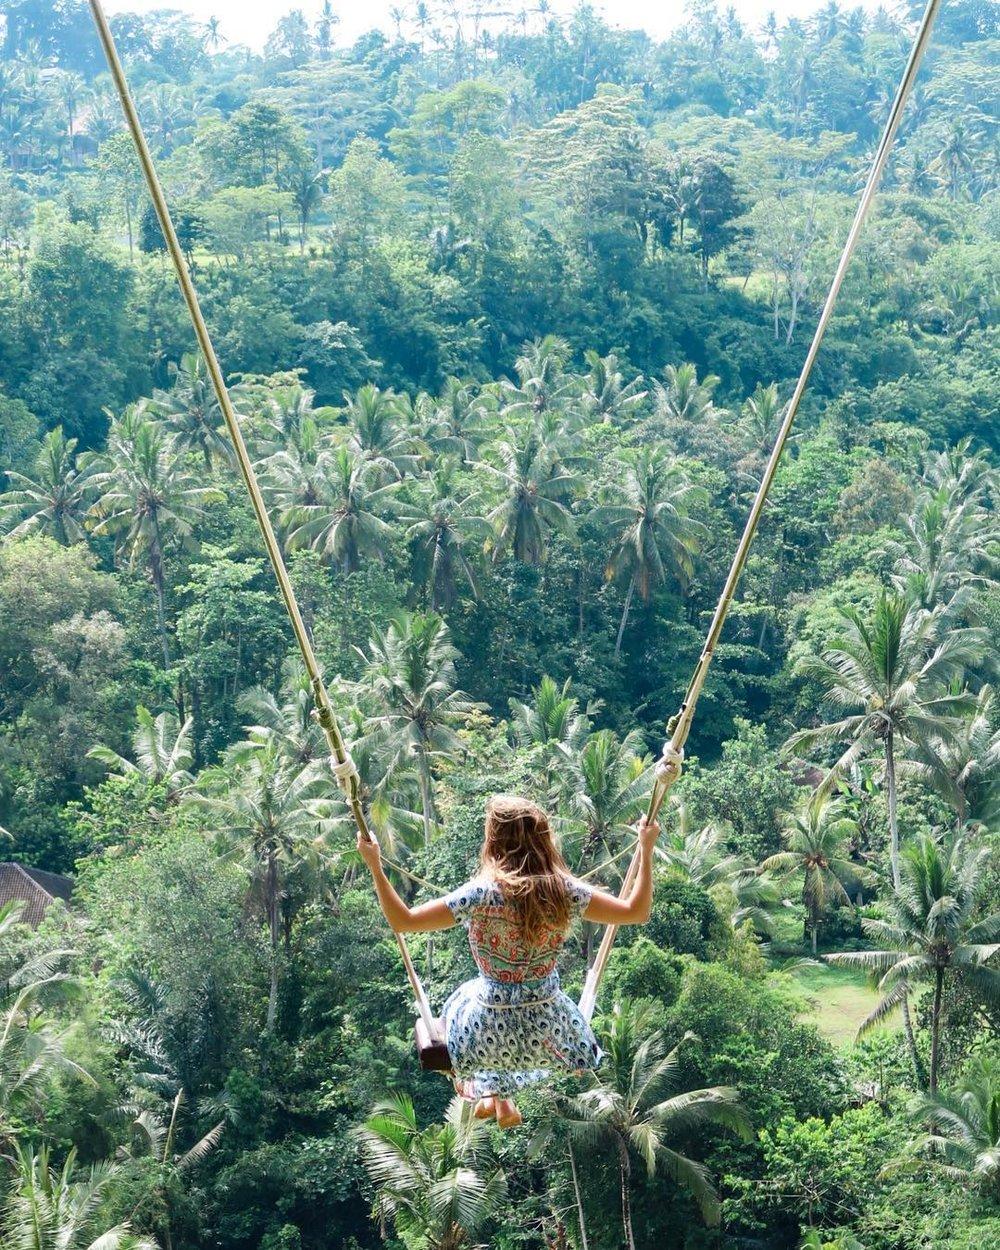 Bali Swing - Elise Darma